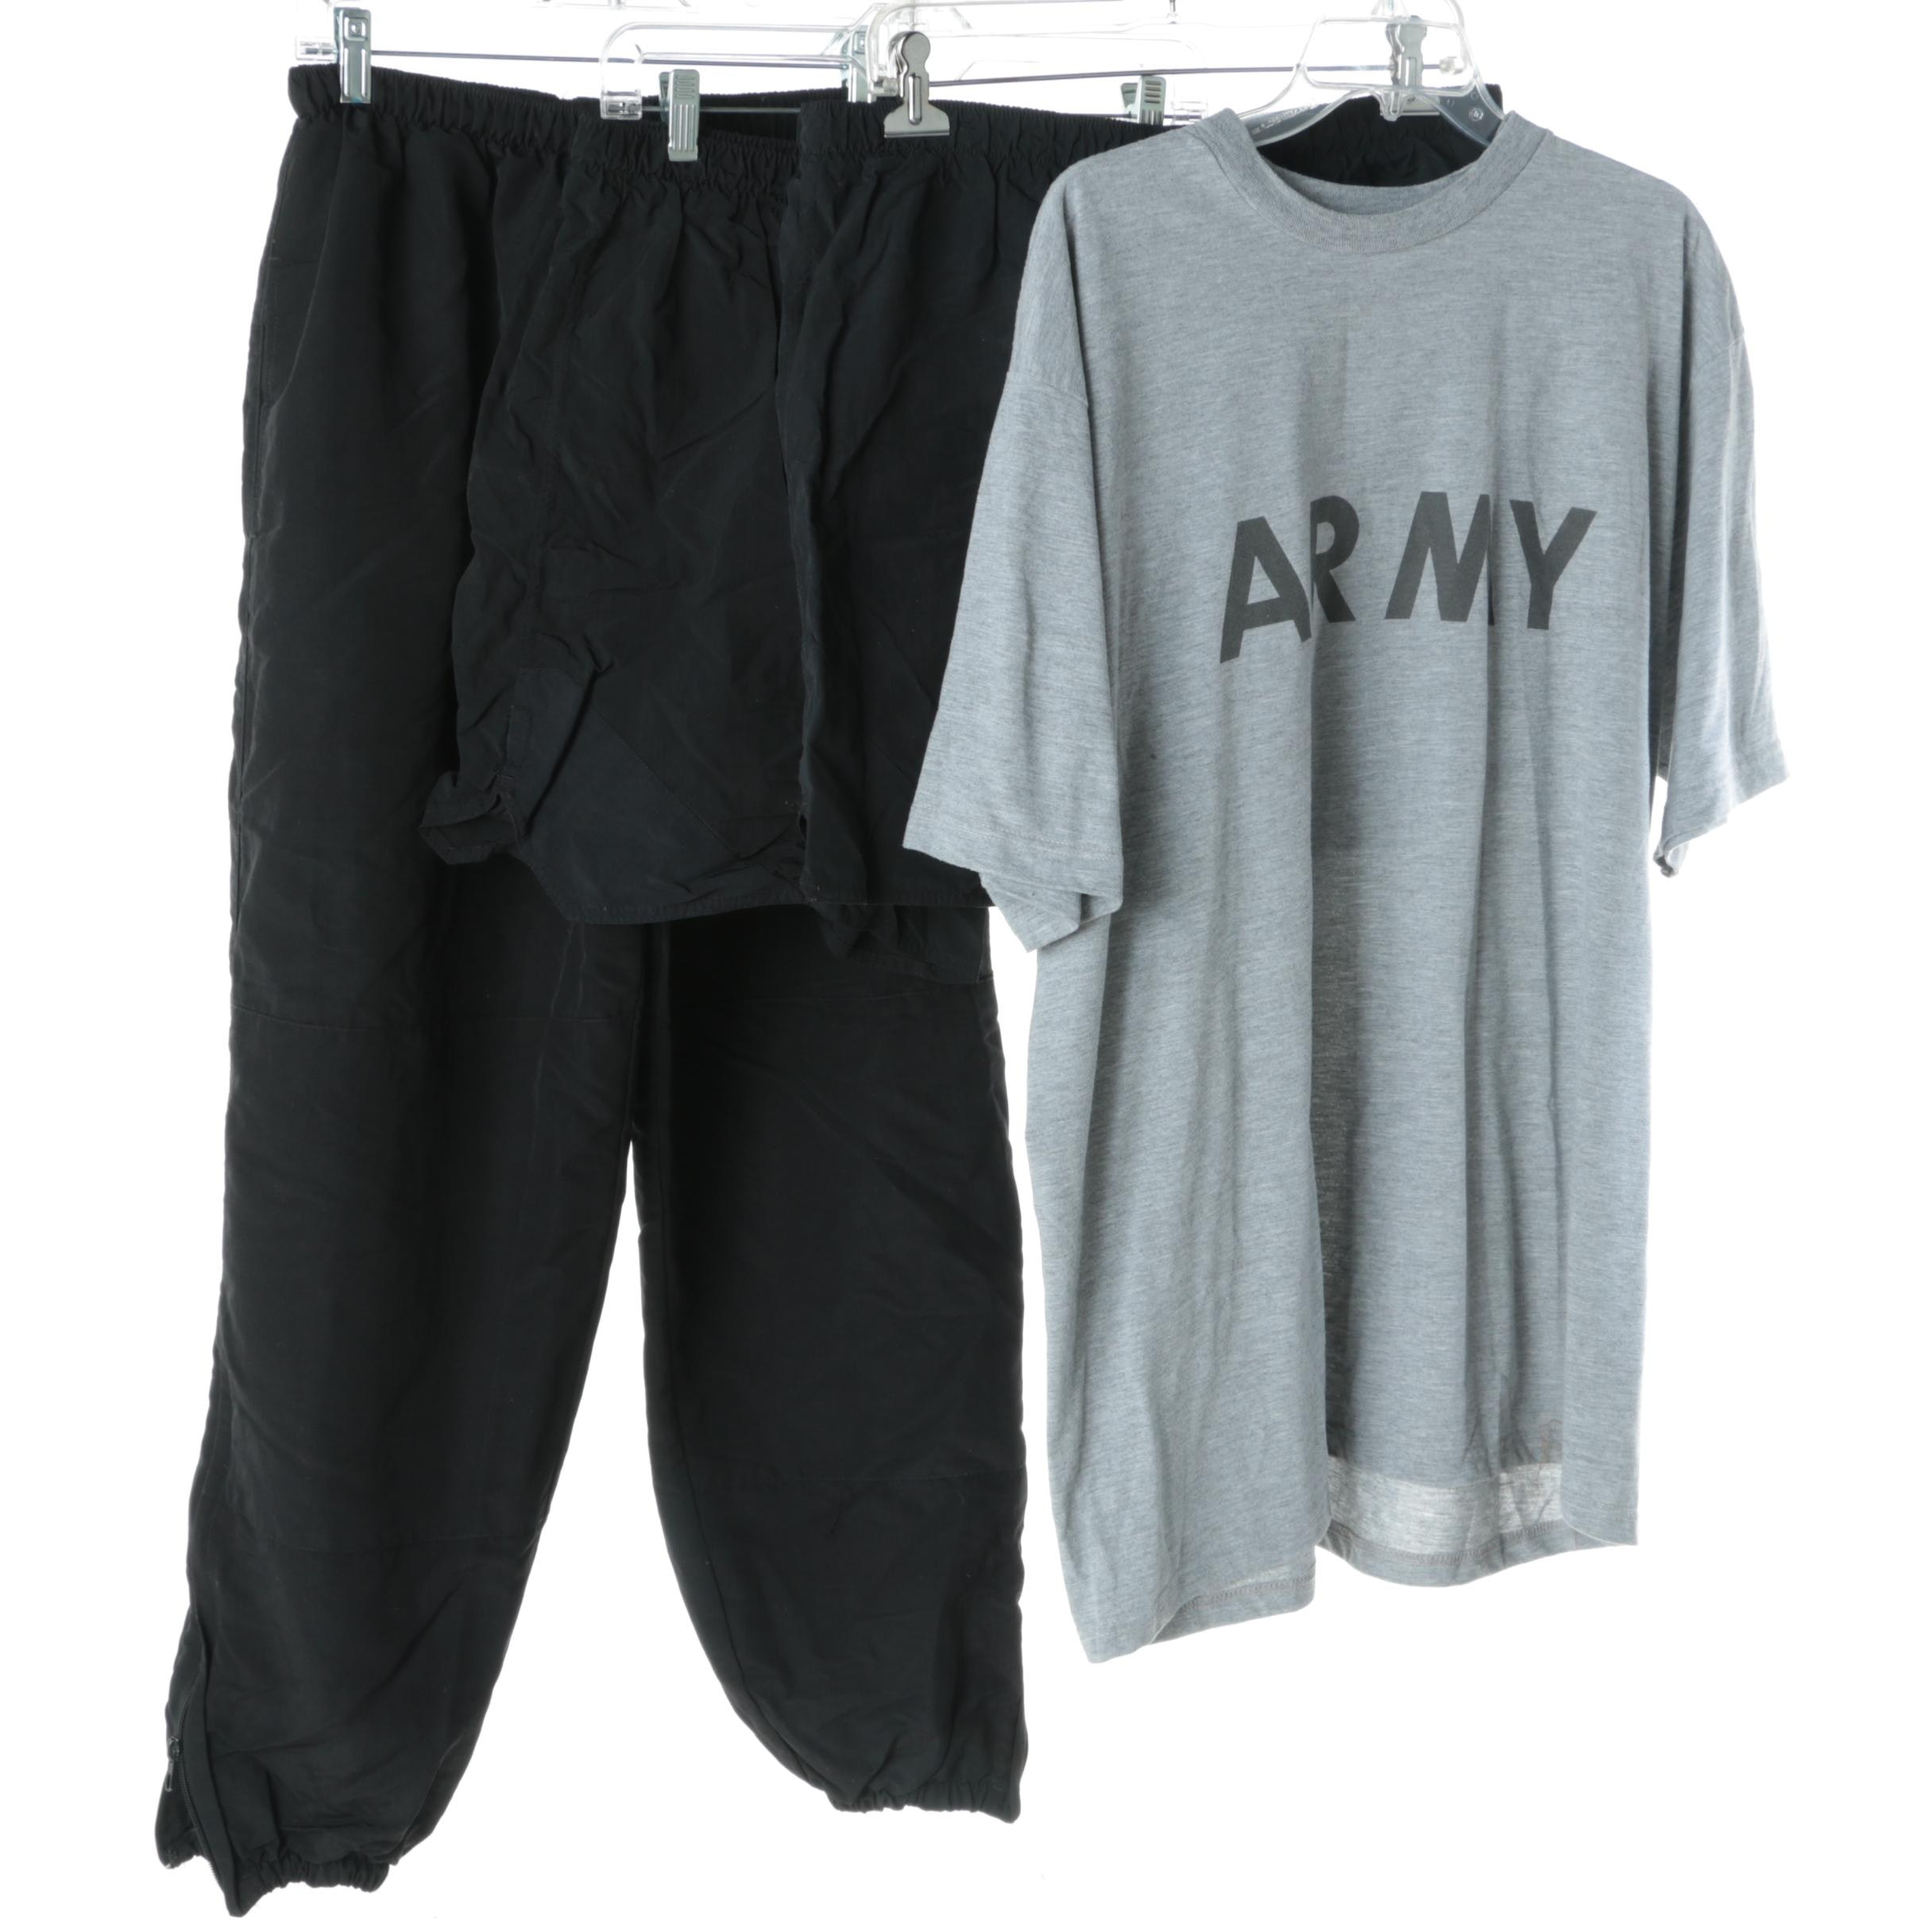 Men's Military Fitness Clothing